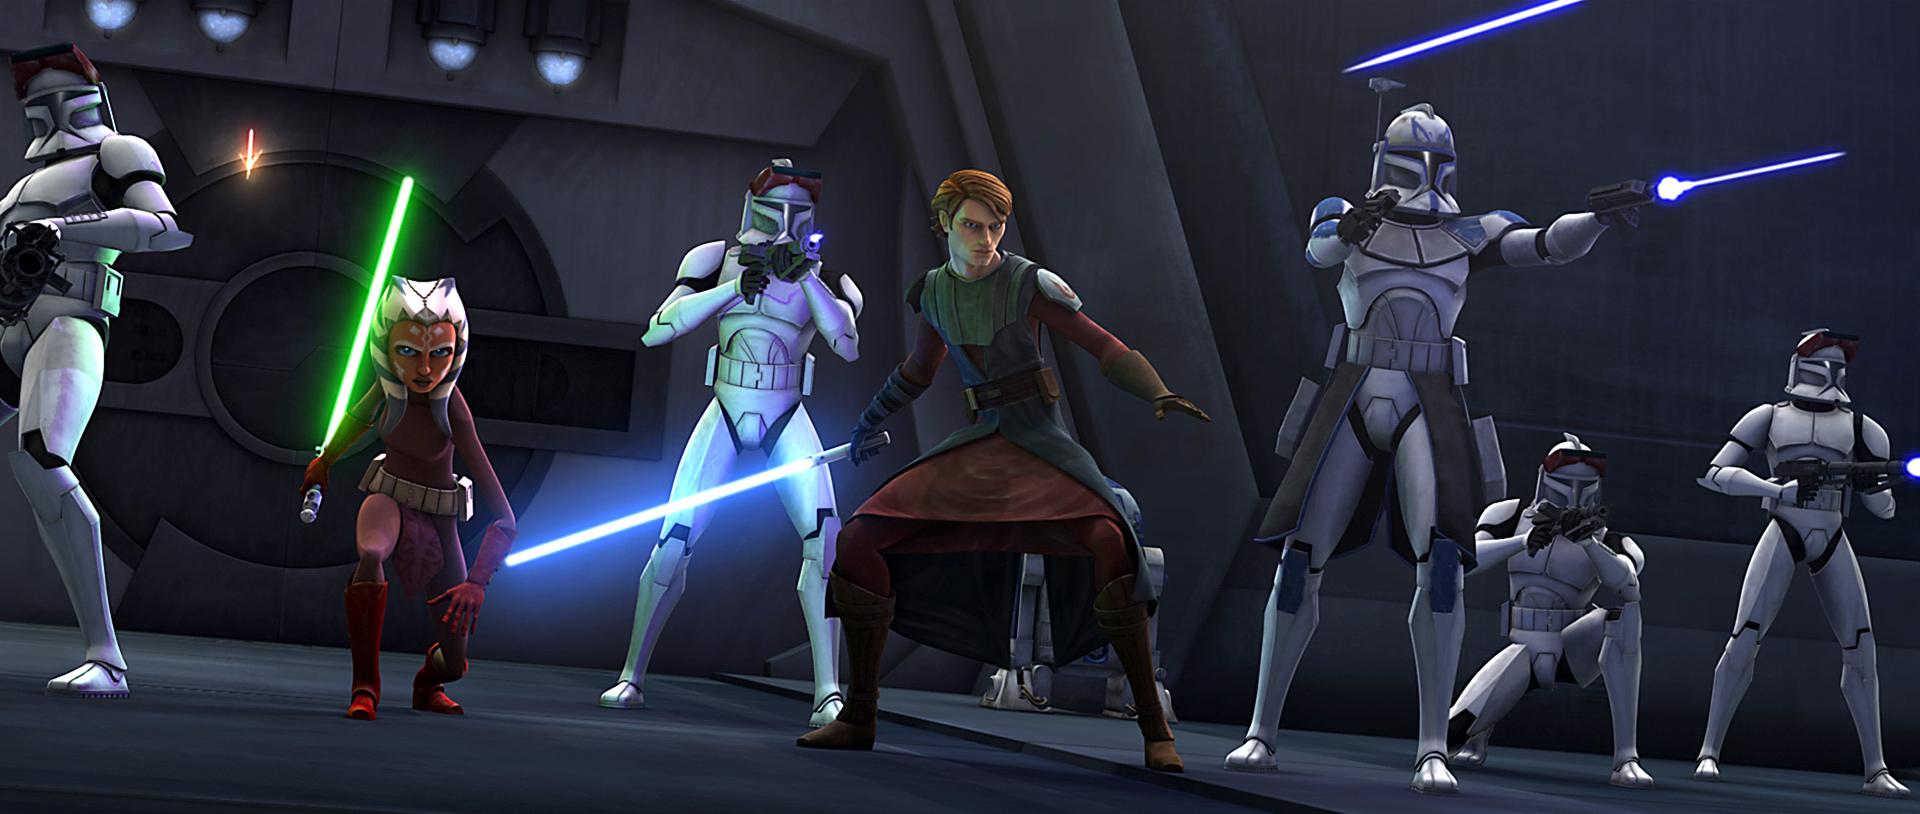 Starwars the clone wars sex nude tube